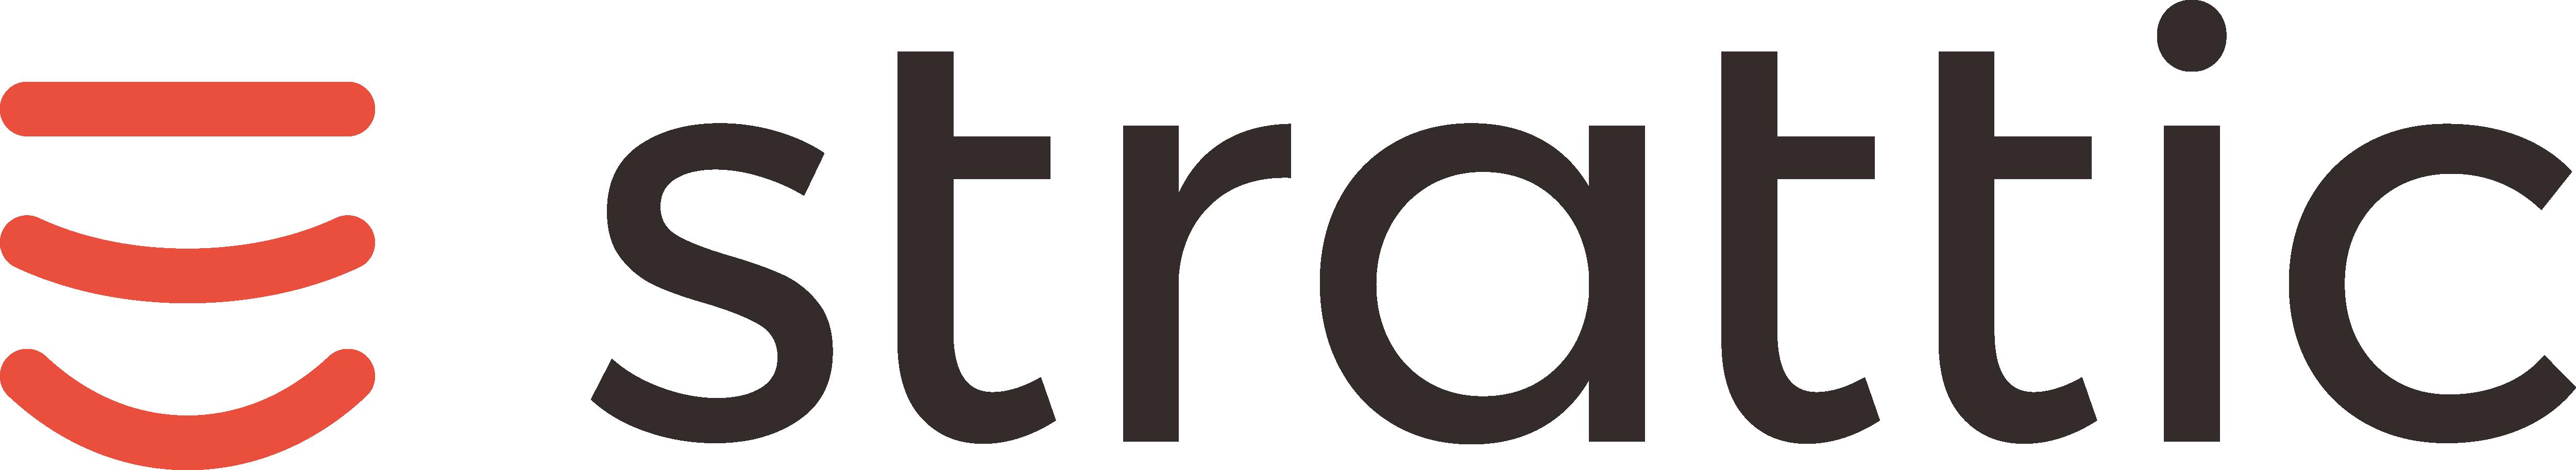 Strattic-Ver1REV-Black-Text-Horizontal-Transparent-PNG